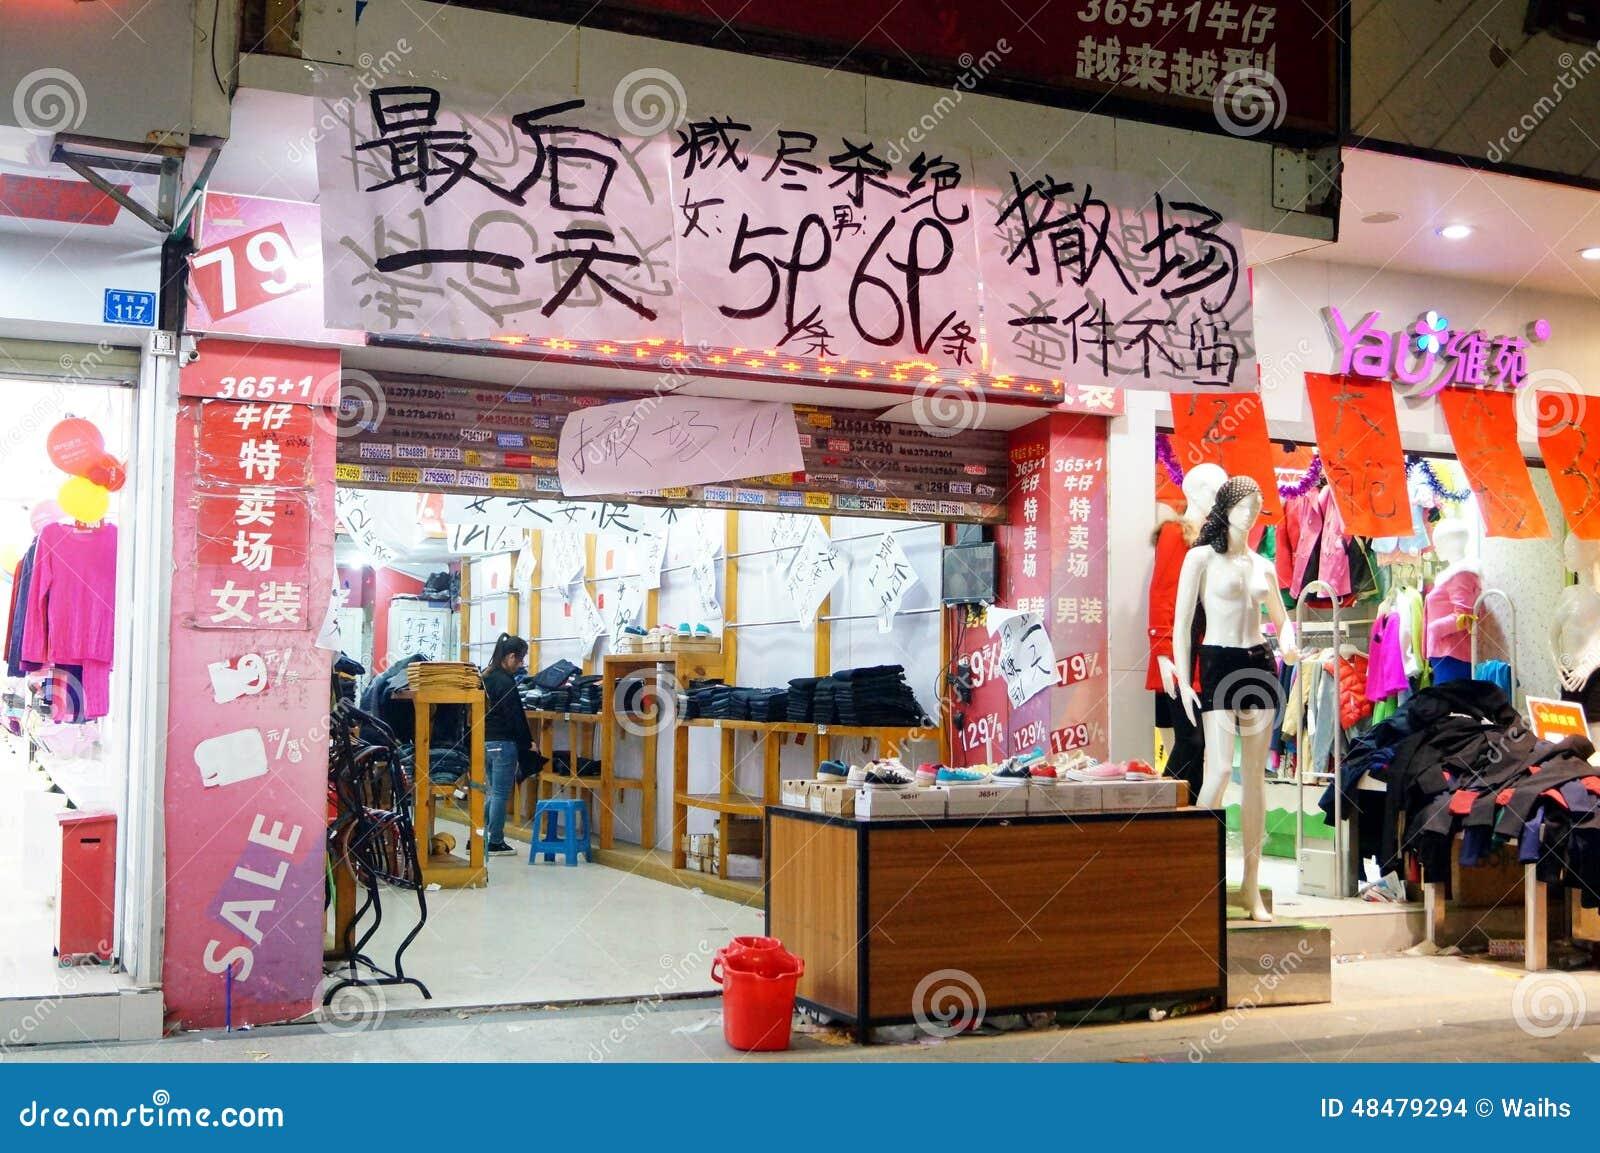 c1fa55cff Propaganda e promoção da loja de roupa na rua comercial de Shenzhen  Xixiang